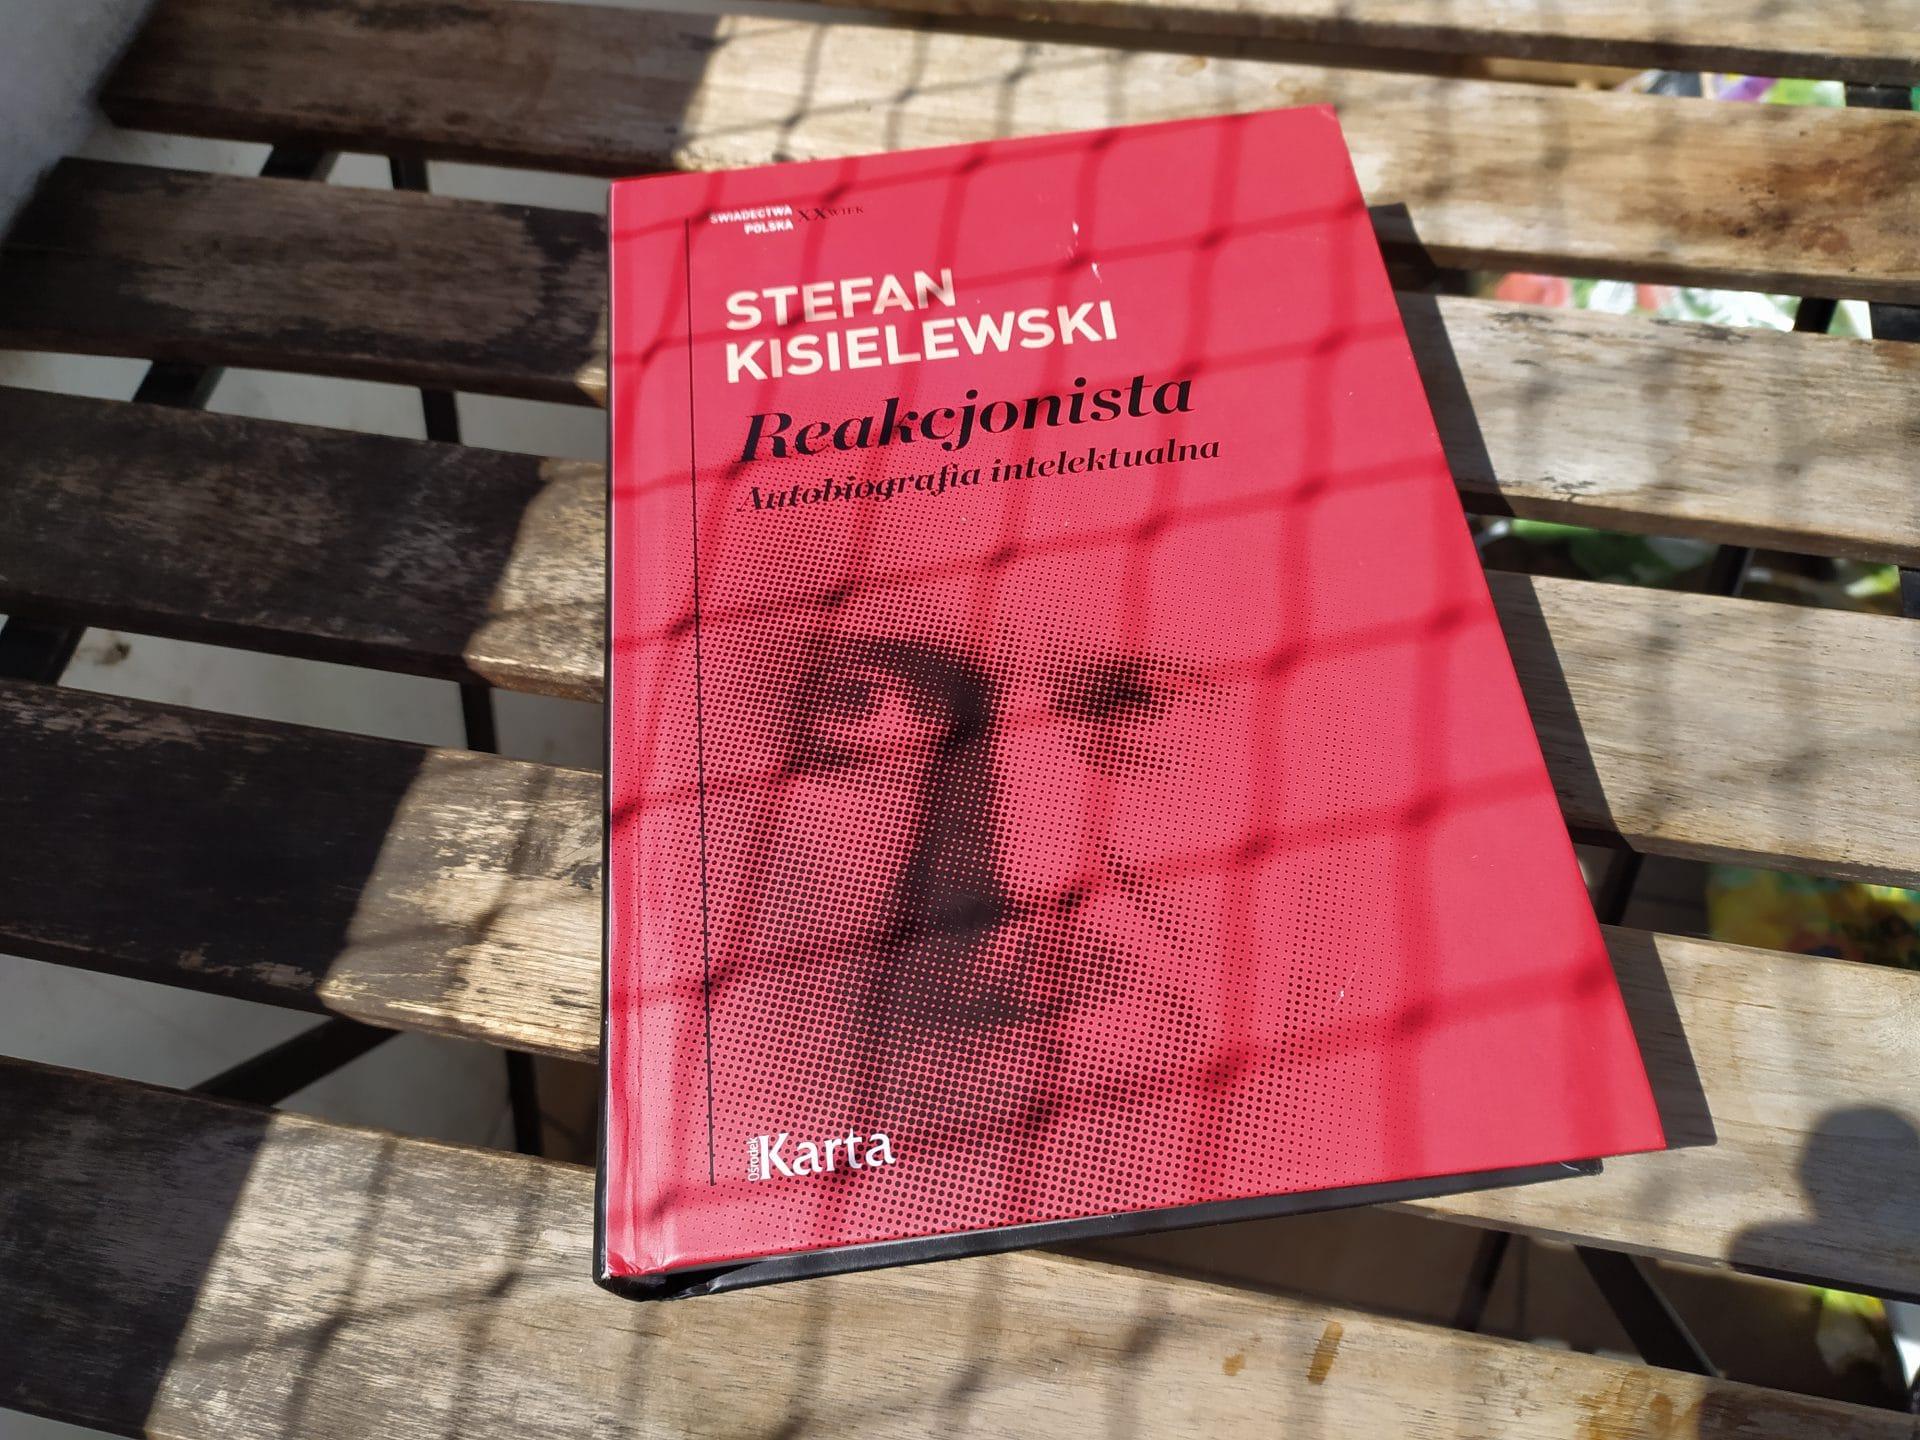 Stefan Kisielewski. Reakcjonista. Autobiografia intelektualna. Ośrodek Karta.